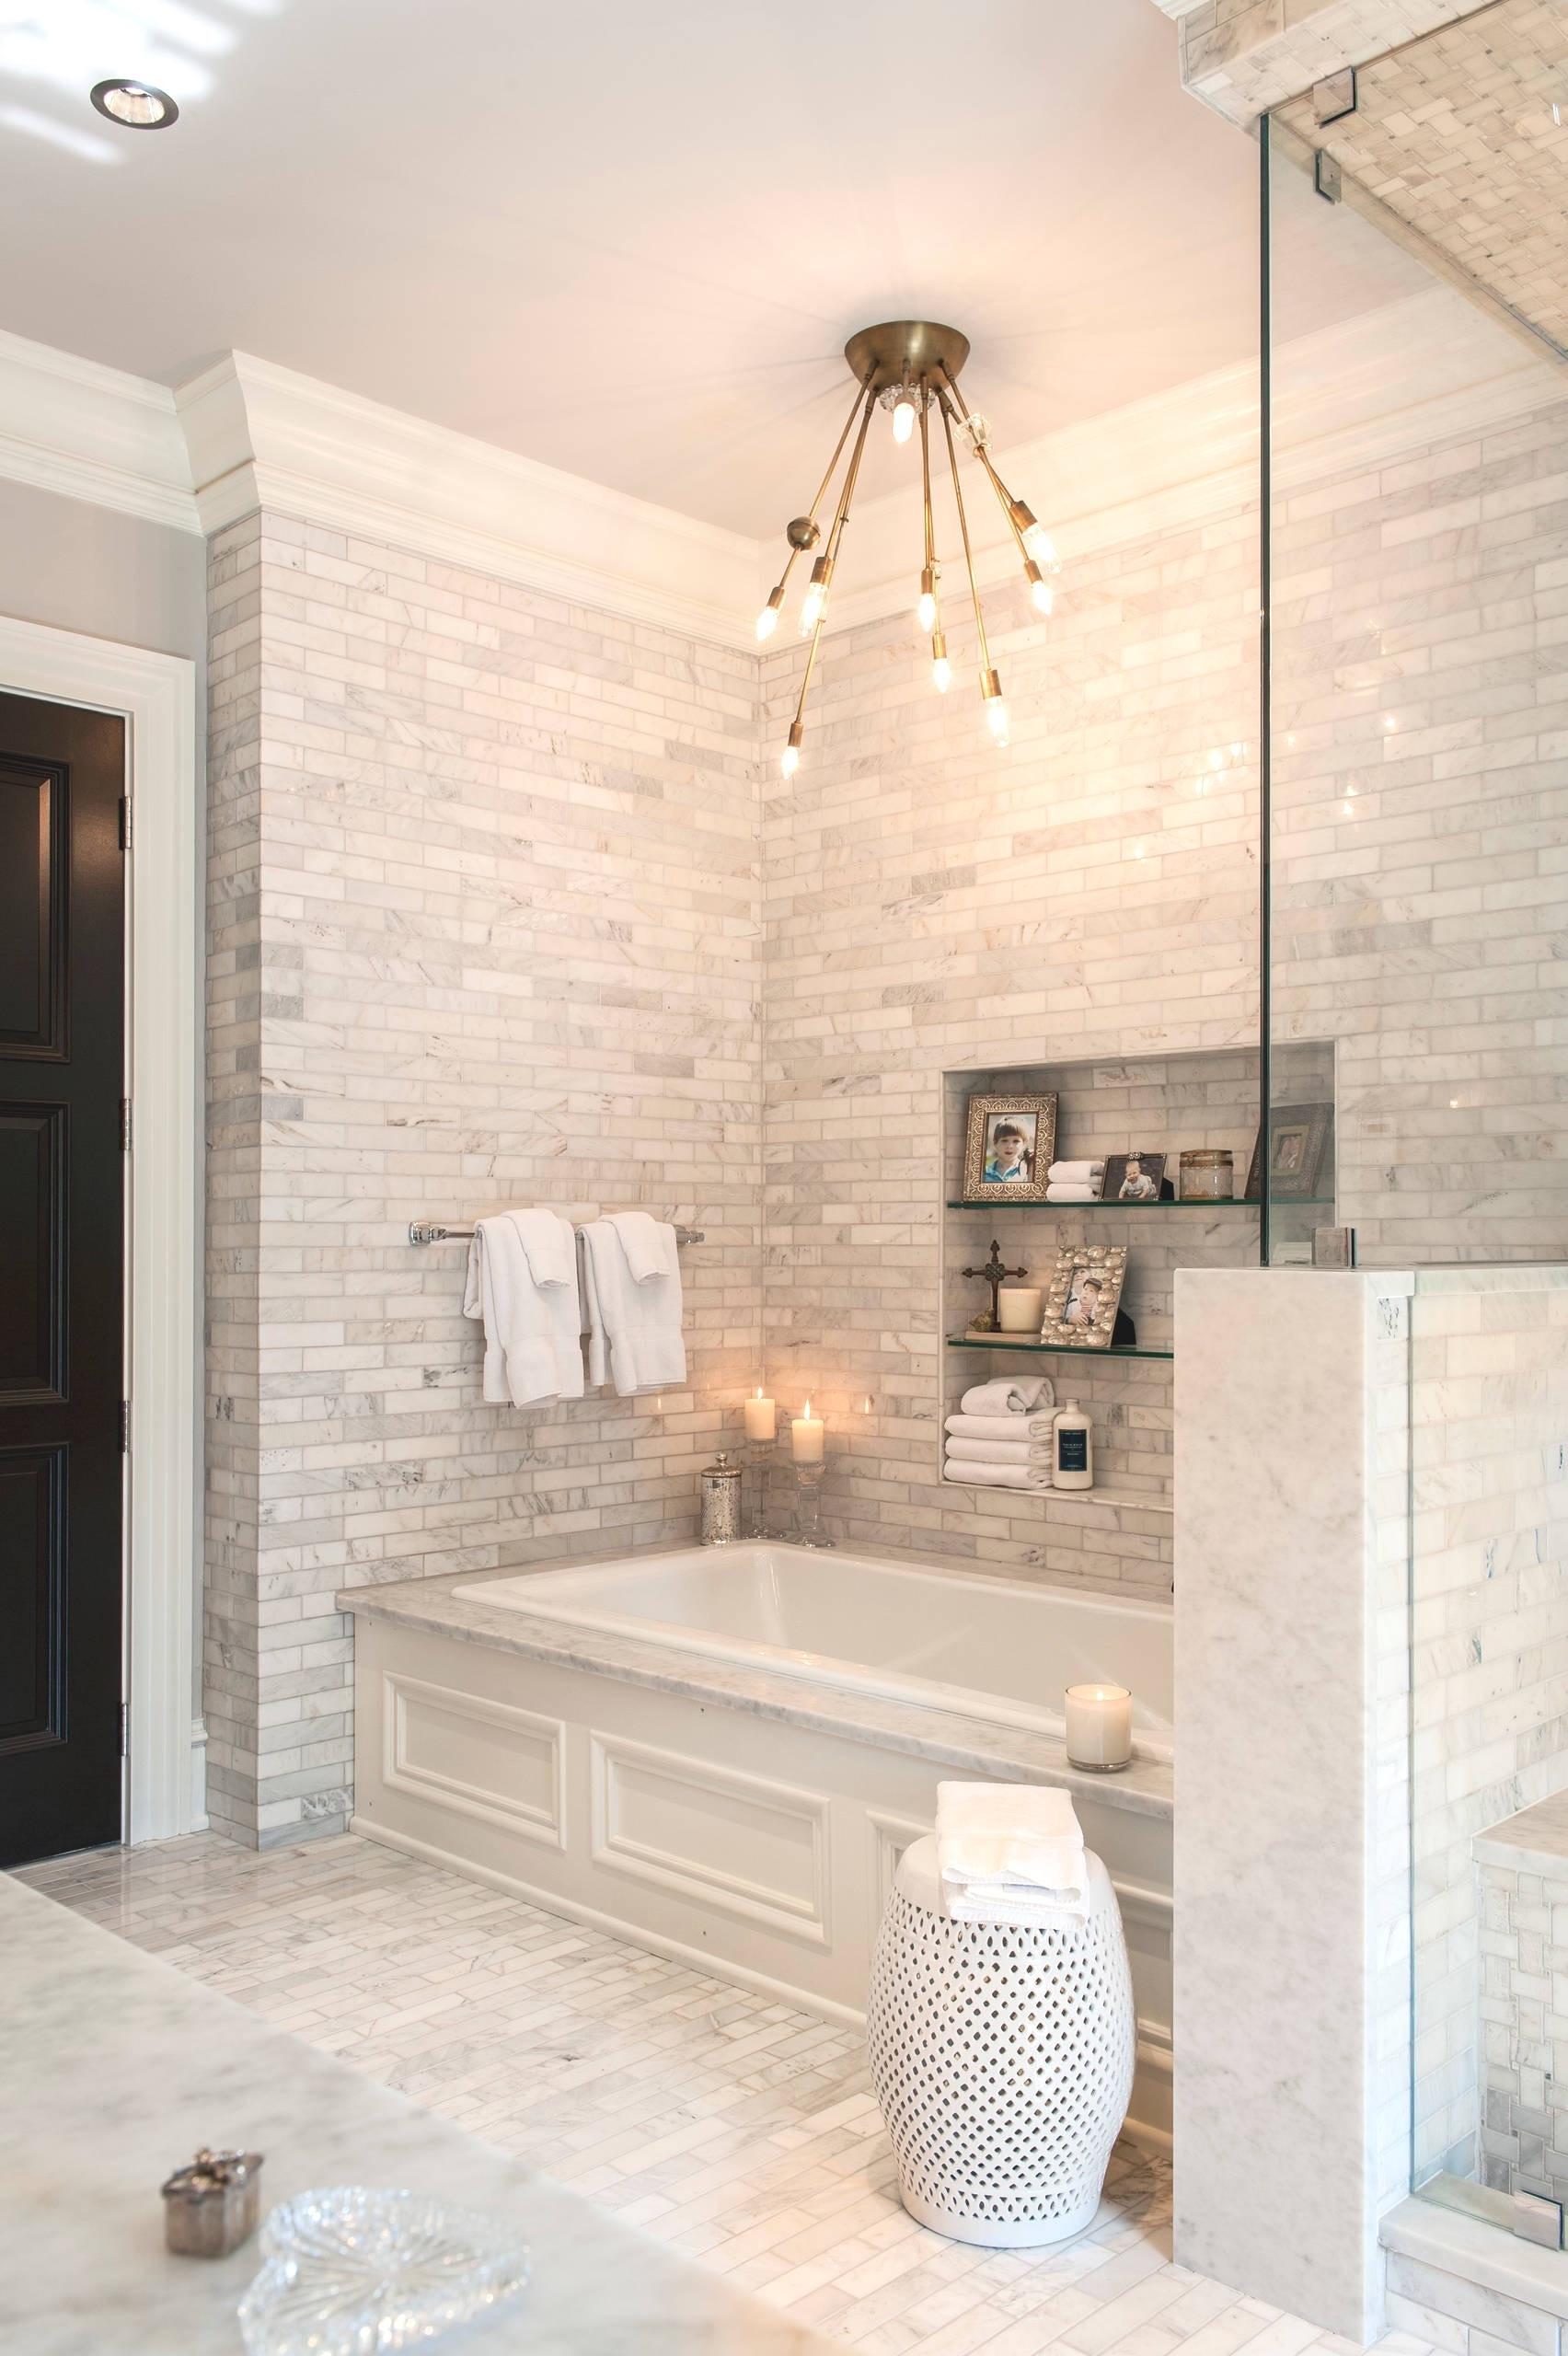 Bathroom Ceiling Lighting Ideas (View 8 of 15)